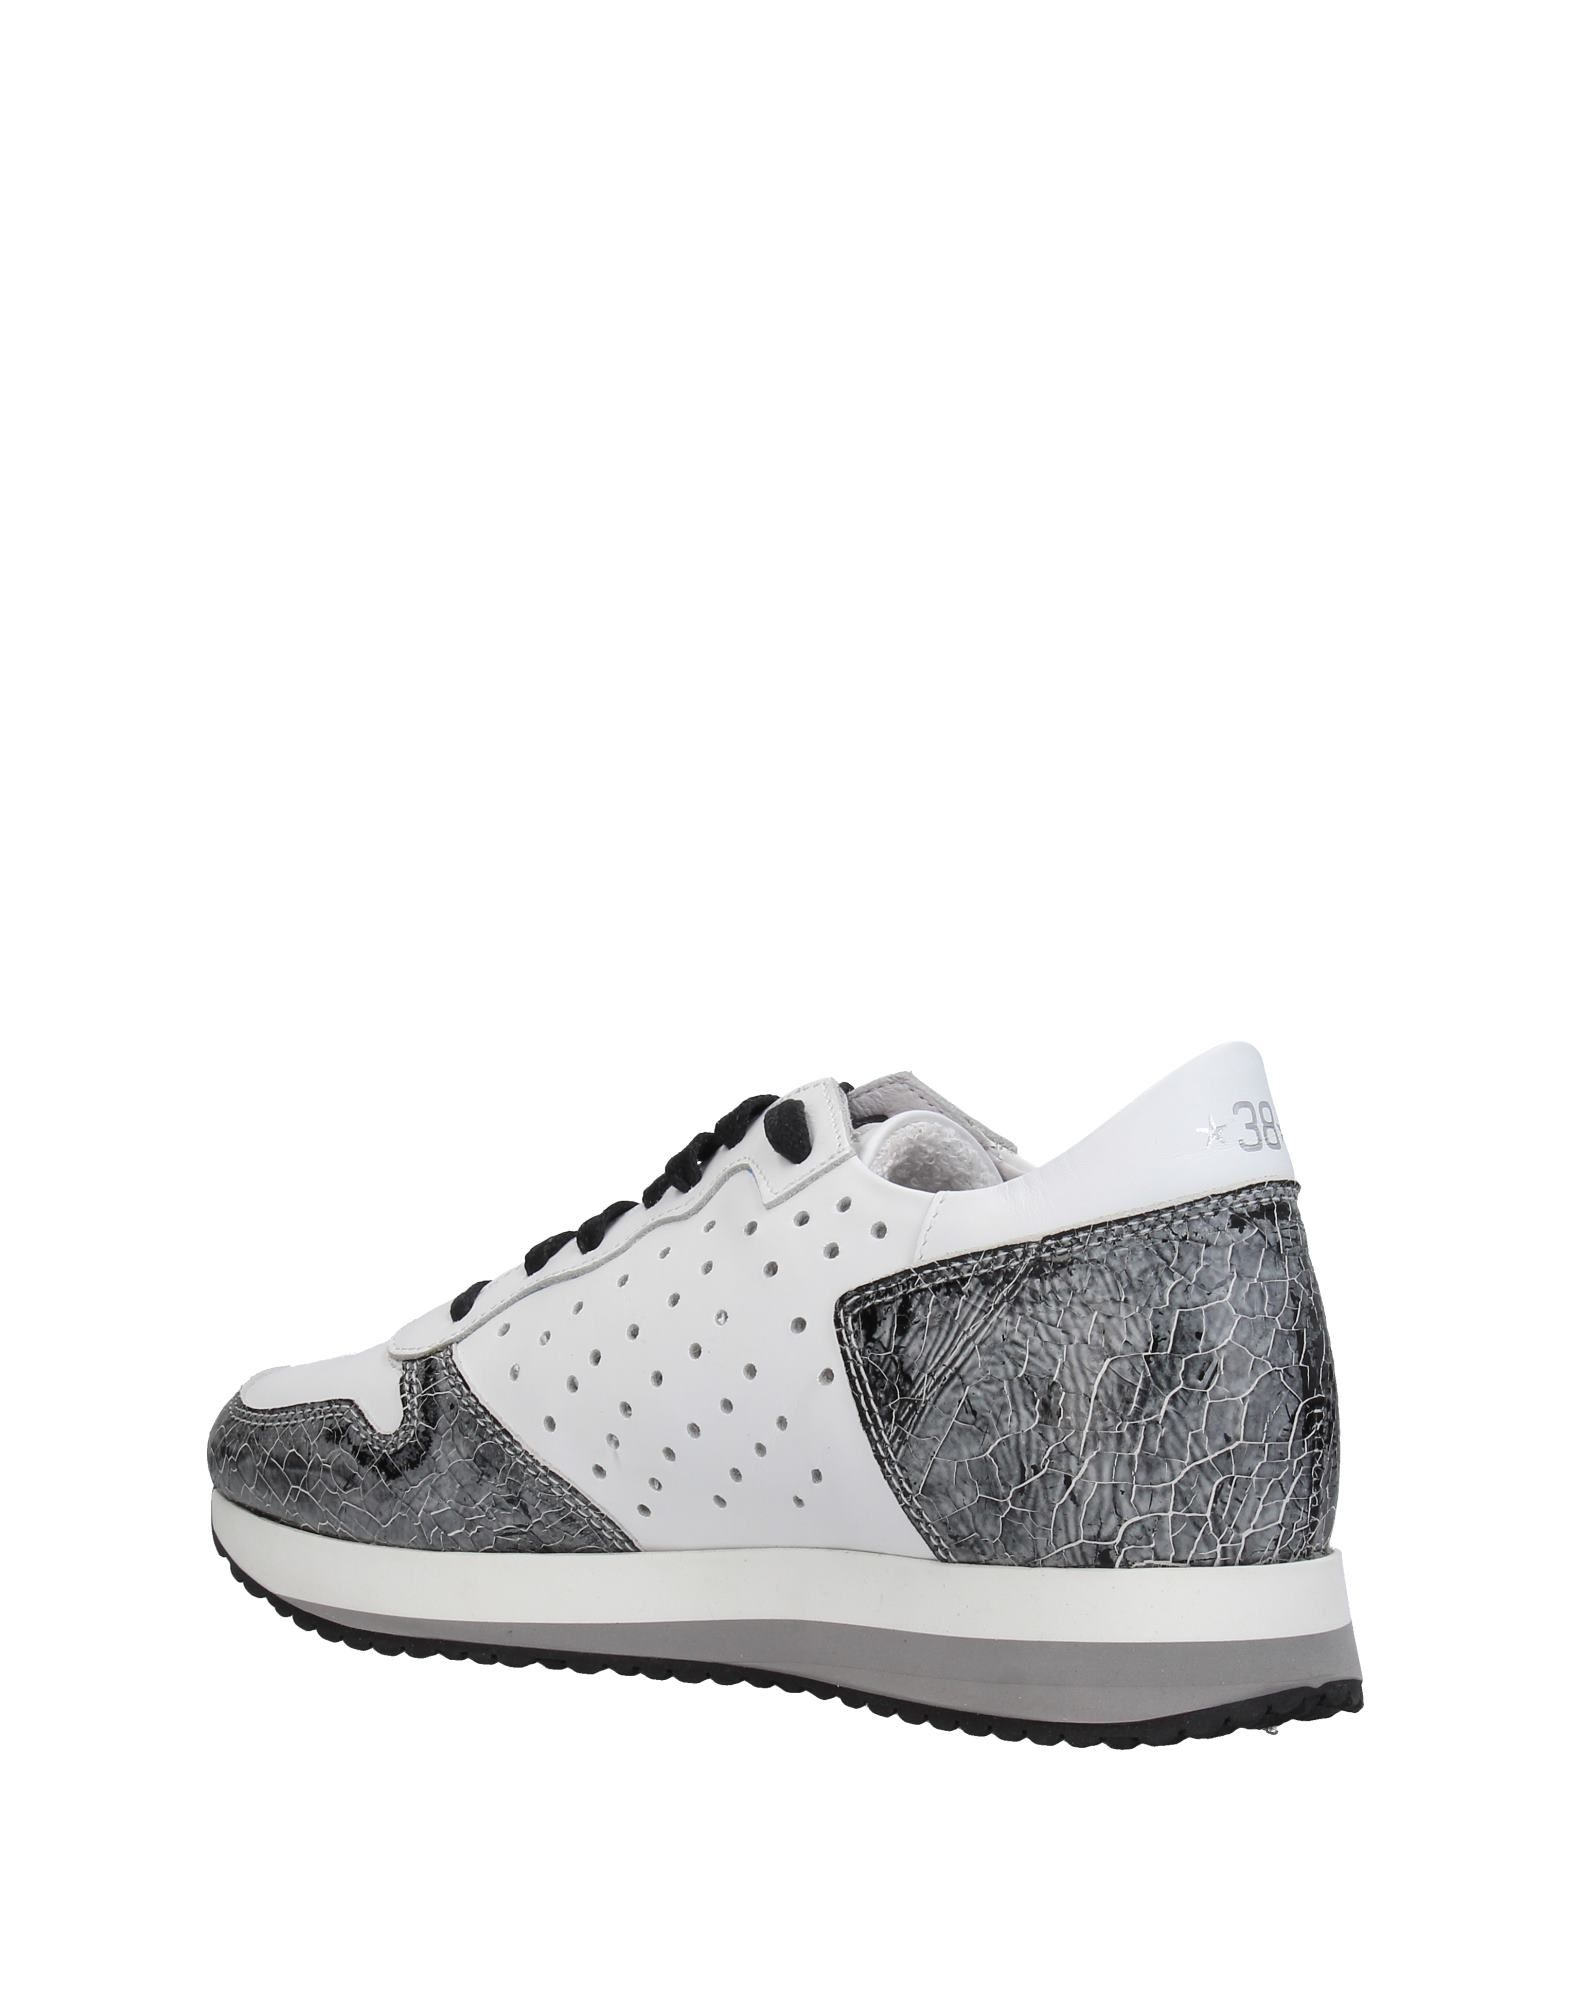 Sneakers Civico 38 Femme - Sneakers Civico 38 sur